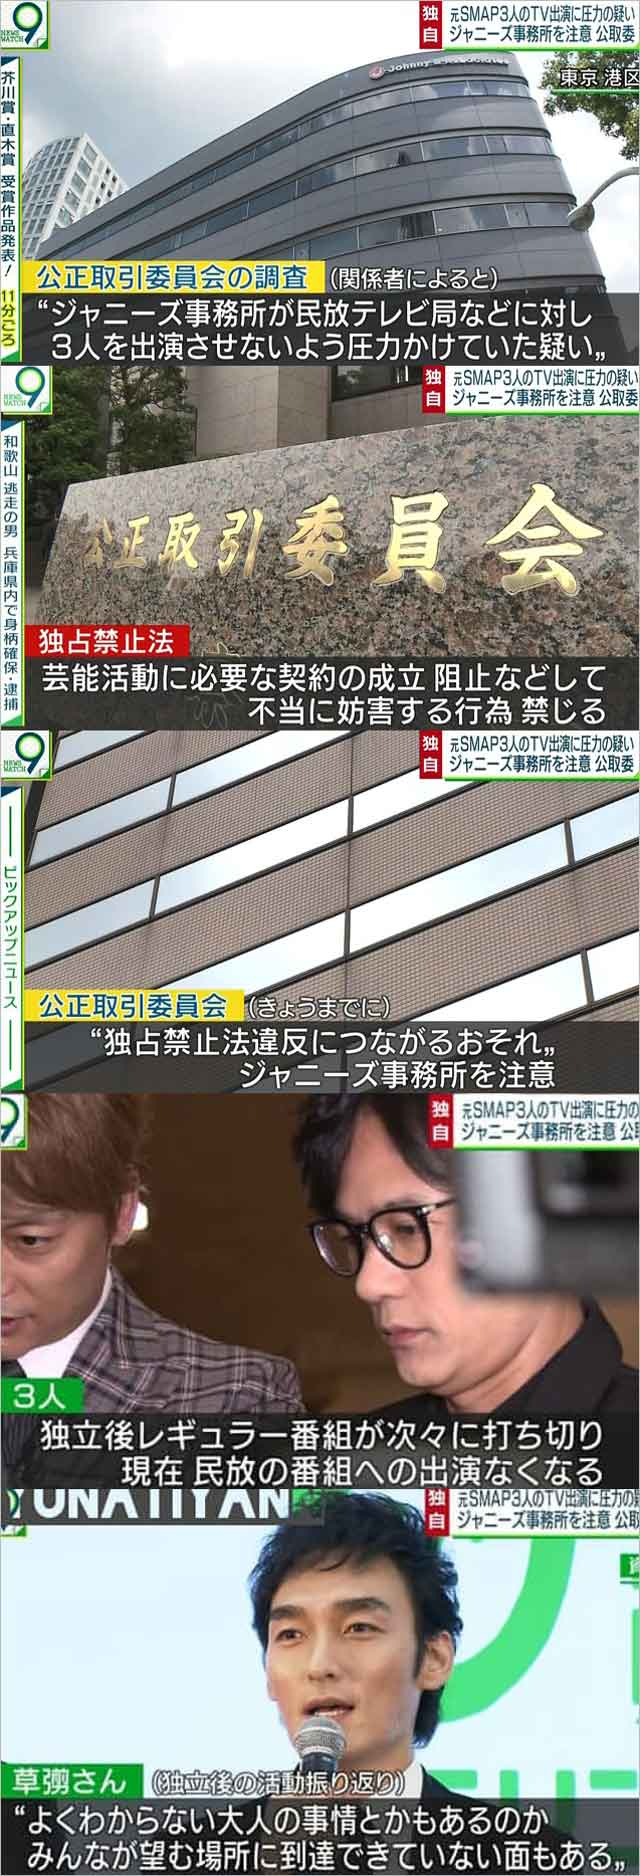 NHKがジャニーズ事務所の圧力疑惑で公取委から注意を『ニュースウオッチ9』で報道